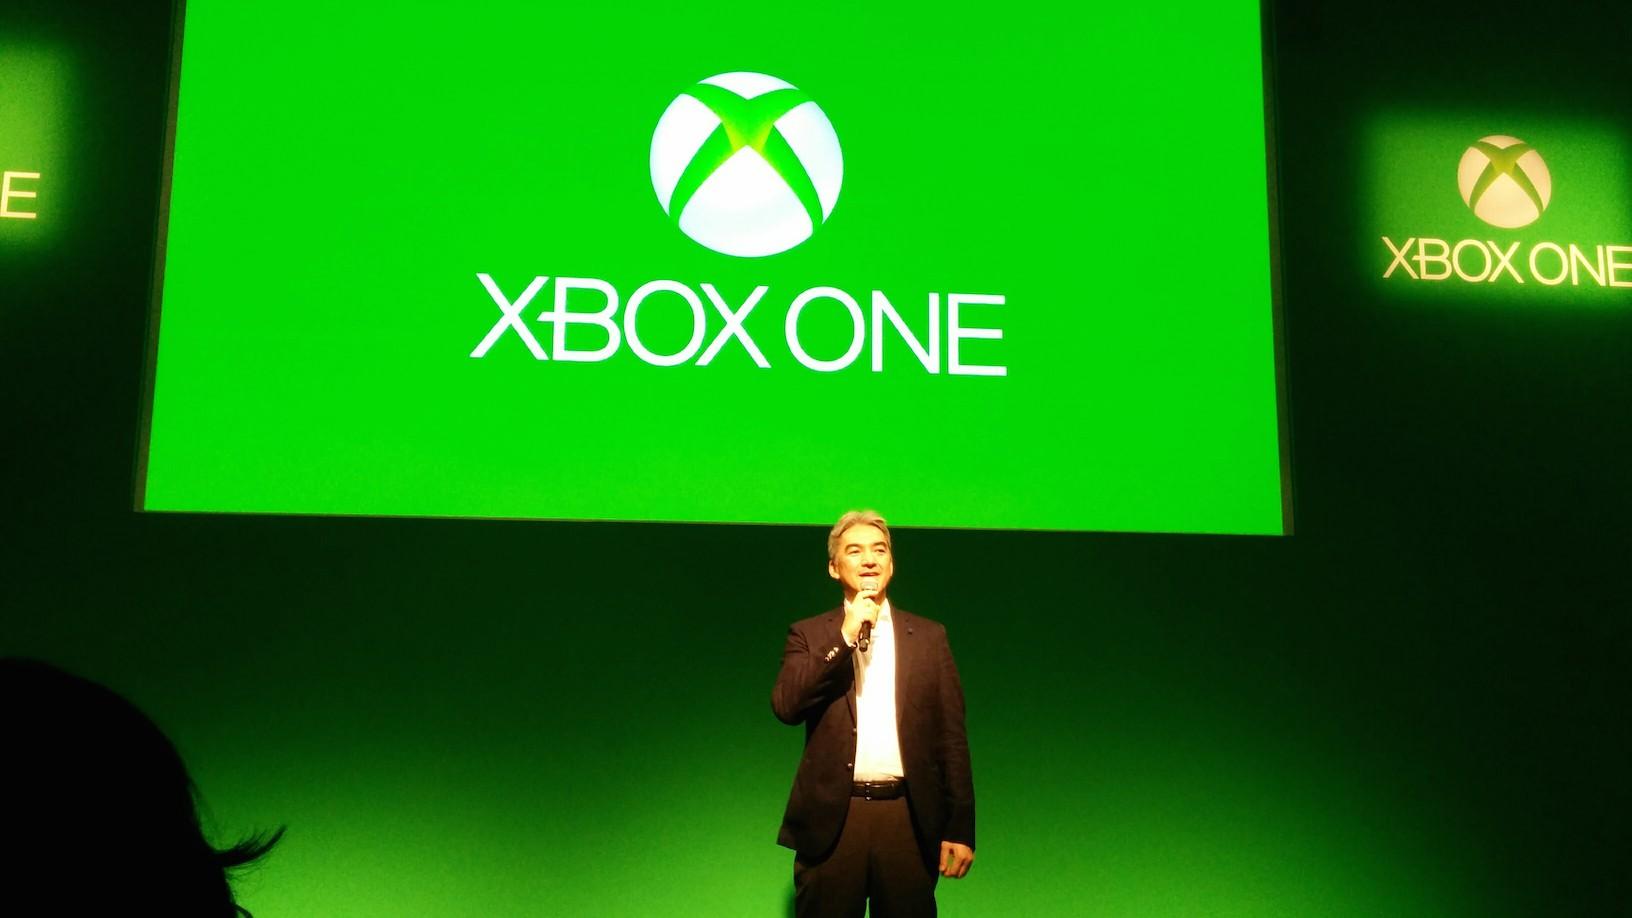 Xbox oneプレミアムナイトに参加してきました #XboxOneFest2014